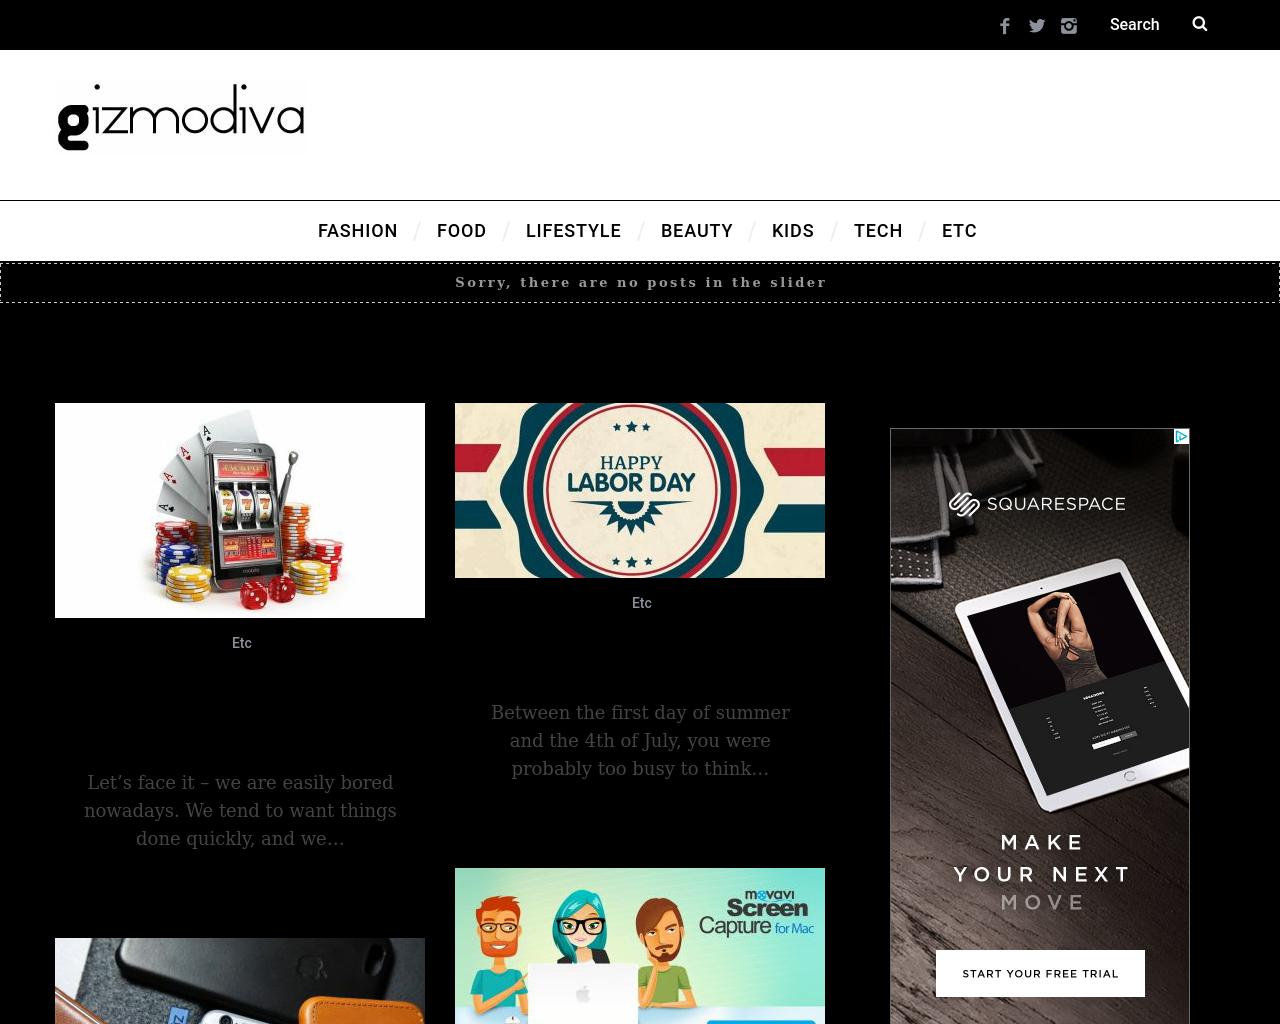 Gizmodiva-Advertising-Reviews-Pricing